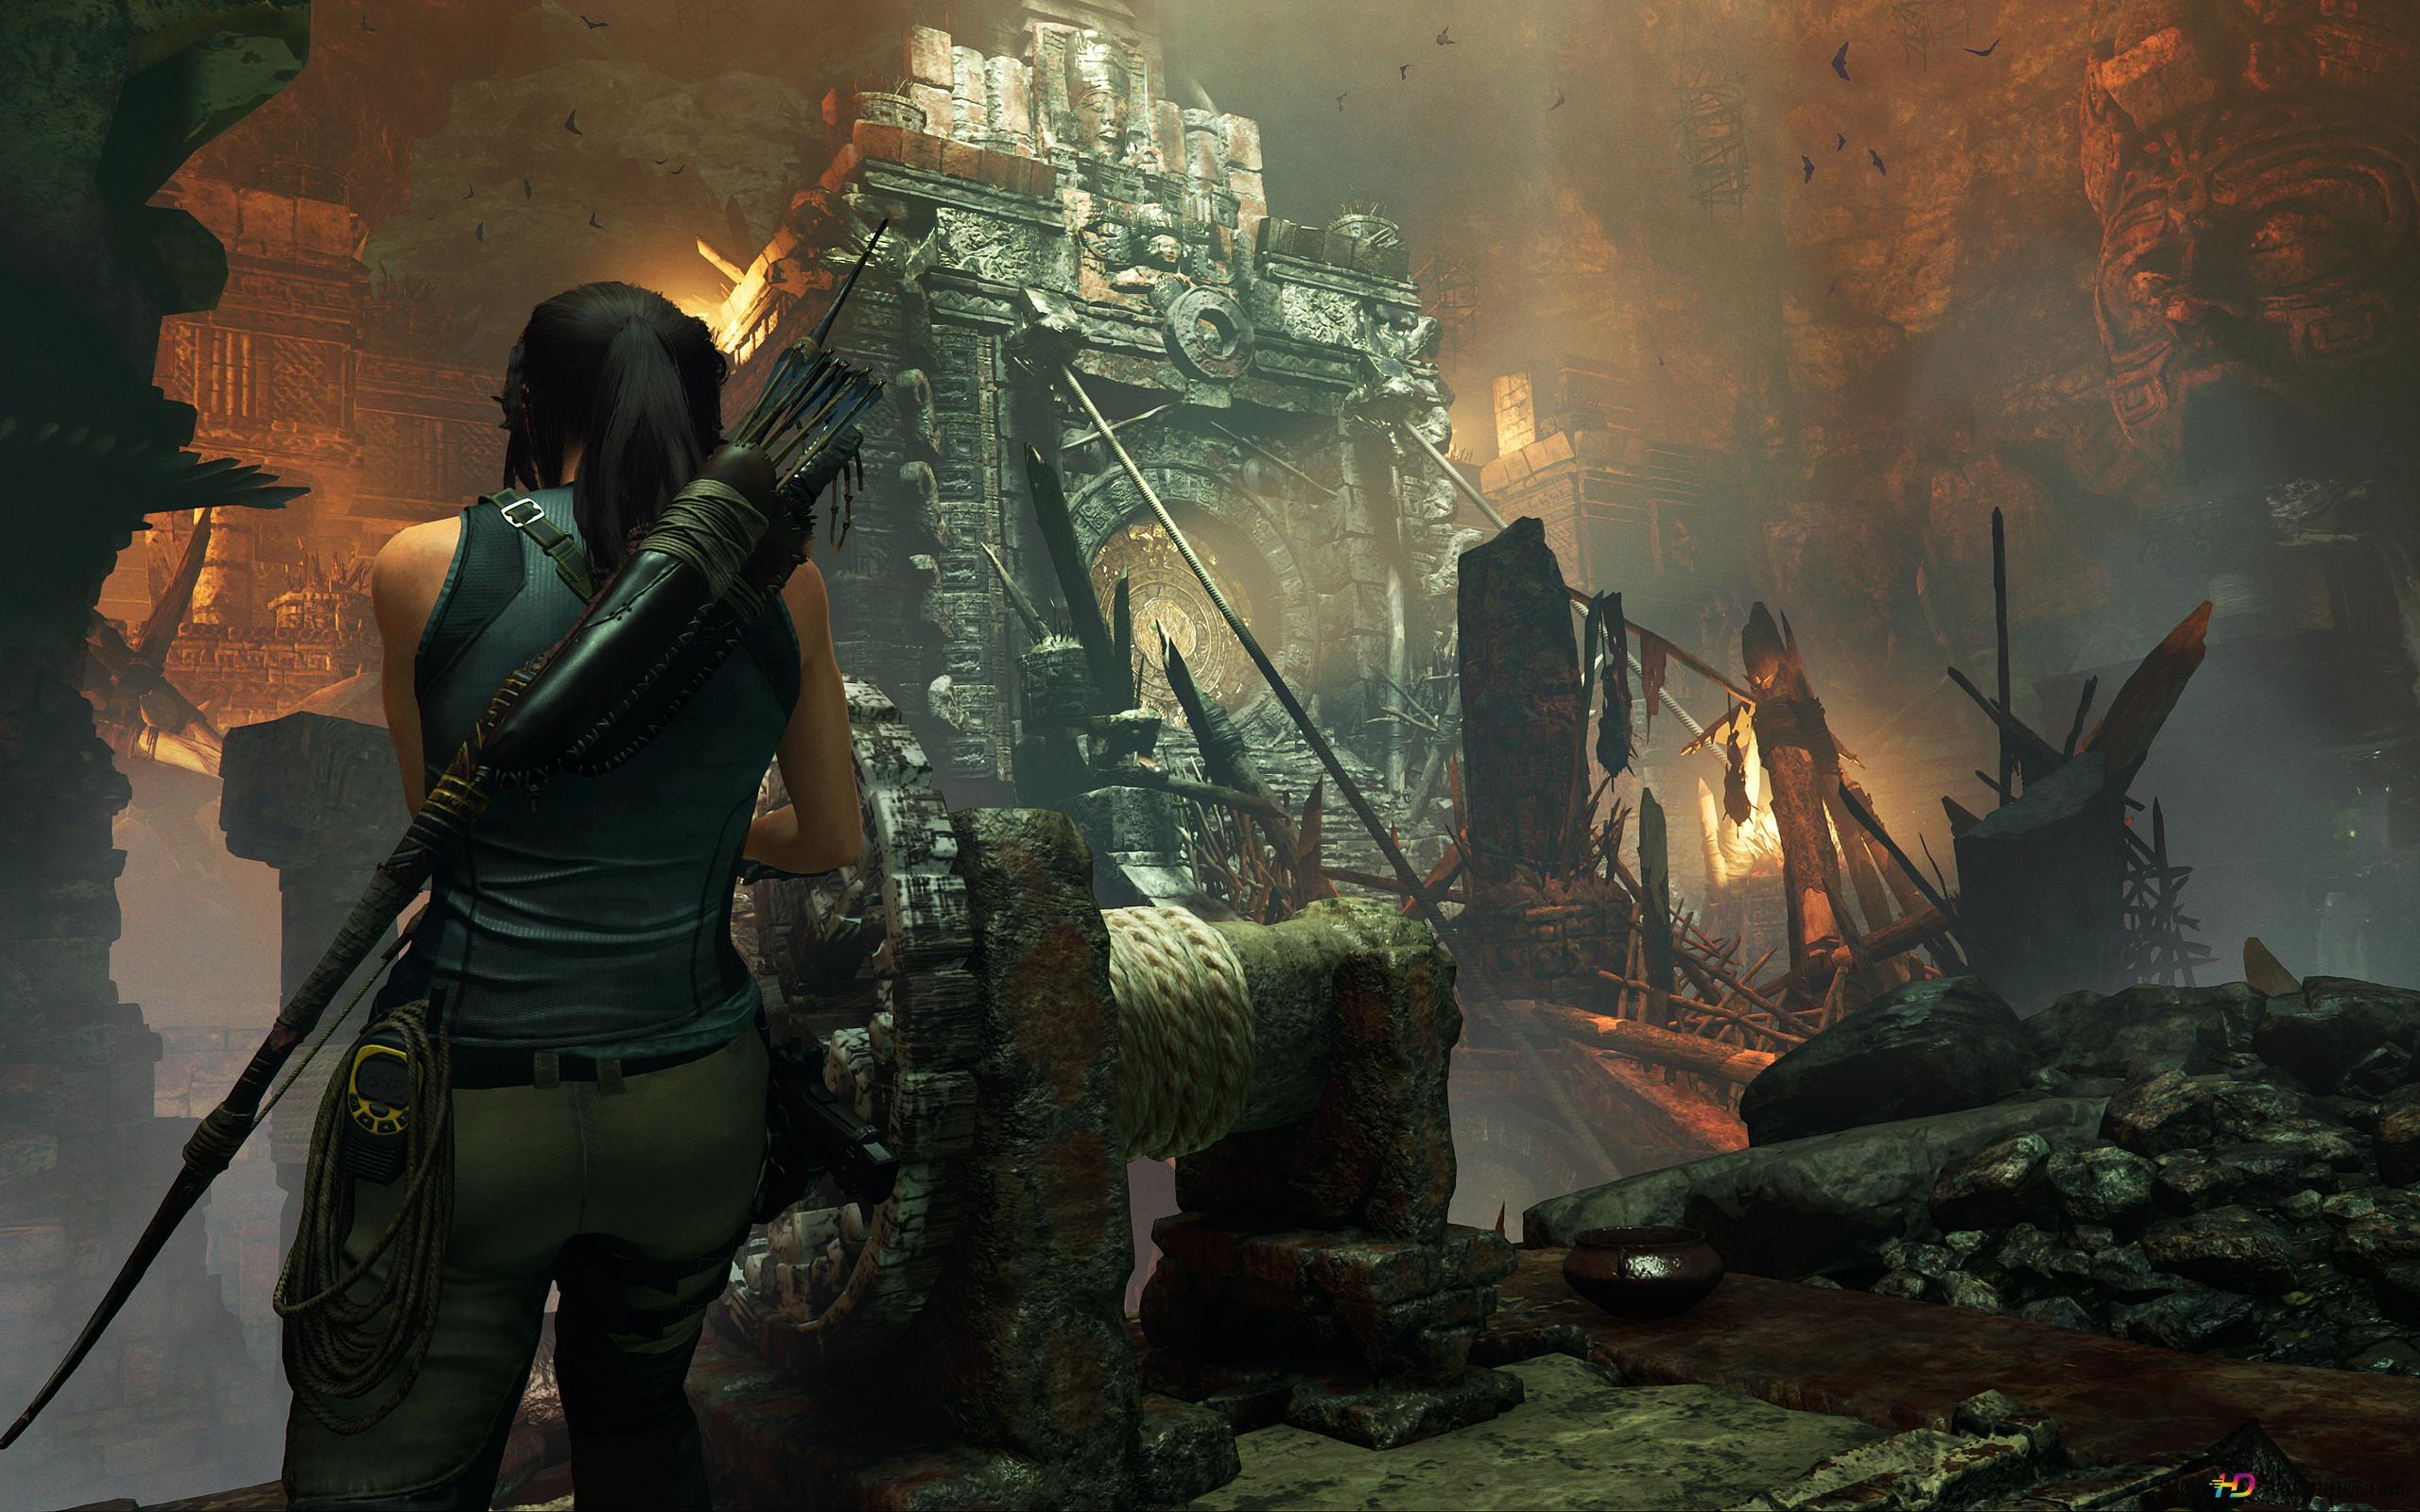 Lara Croft HD Wallpaper Download